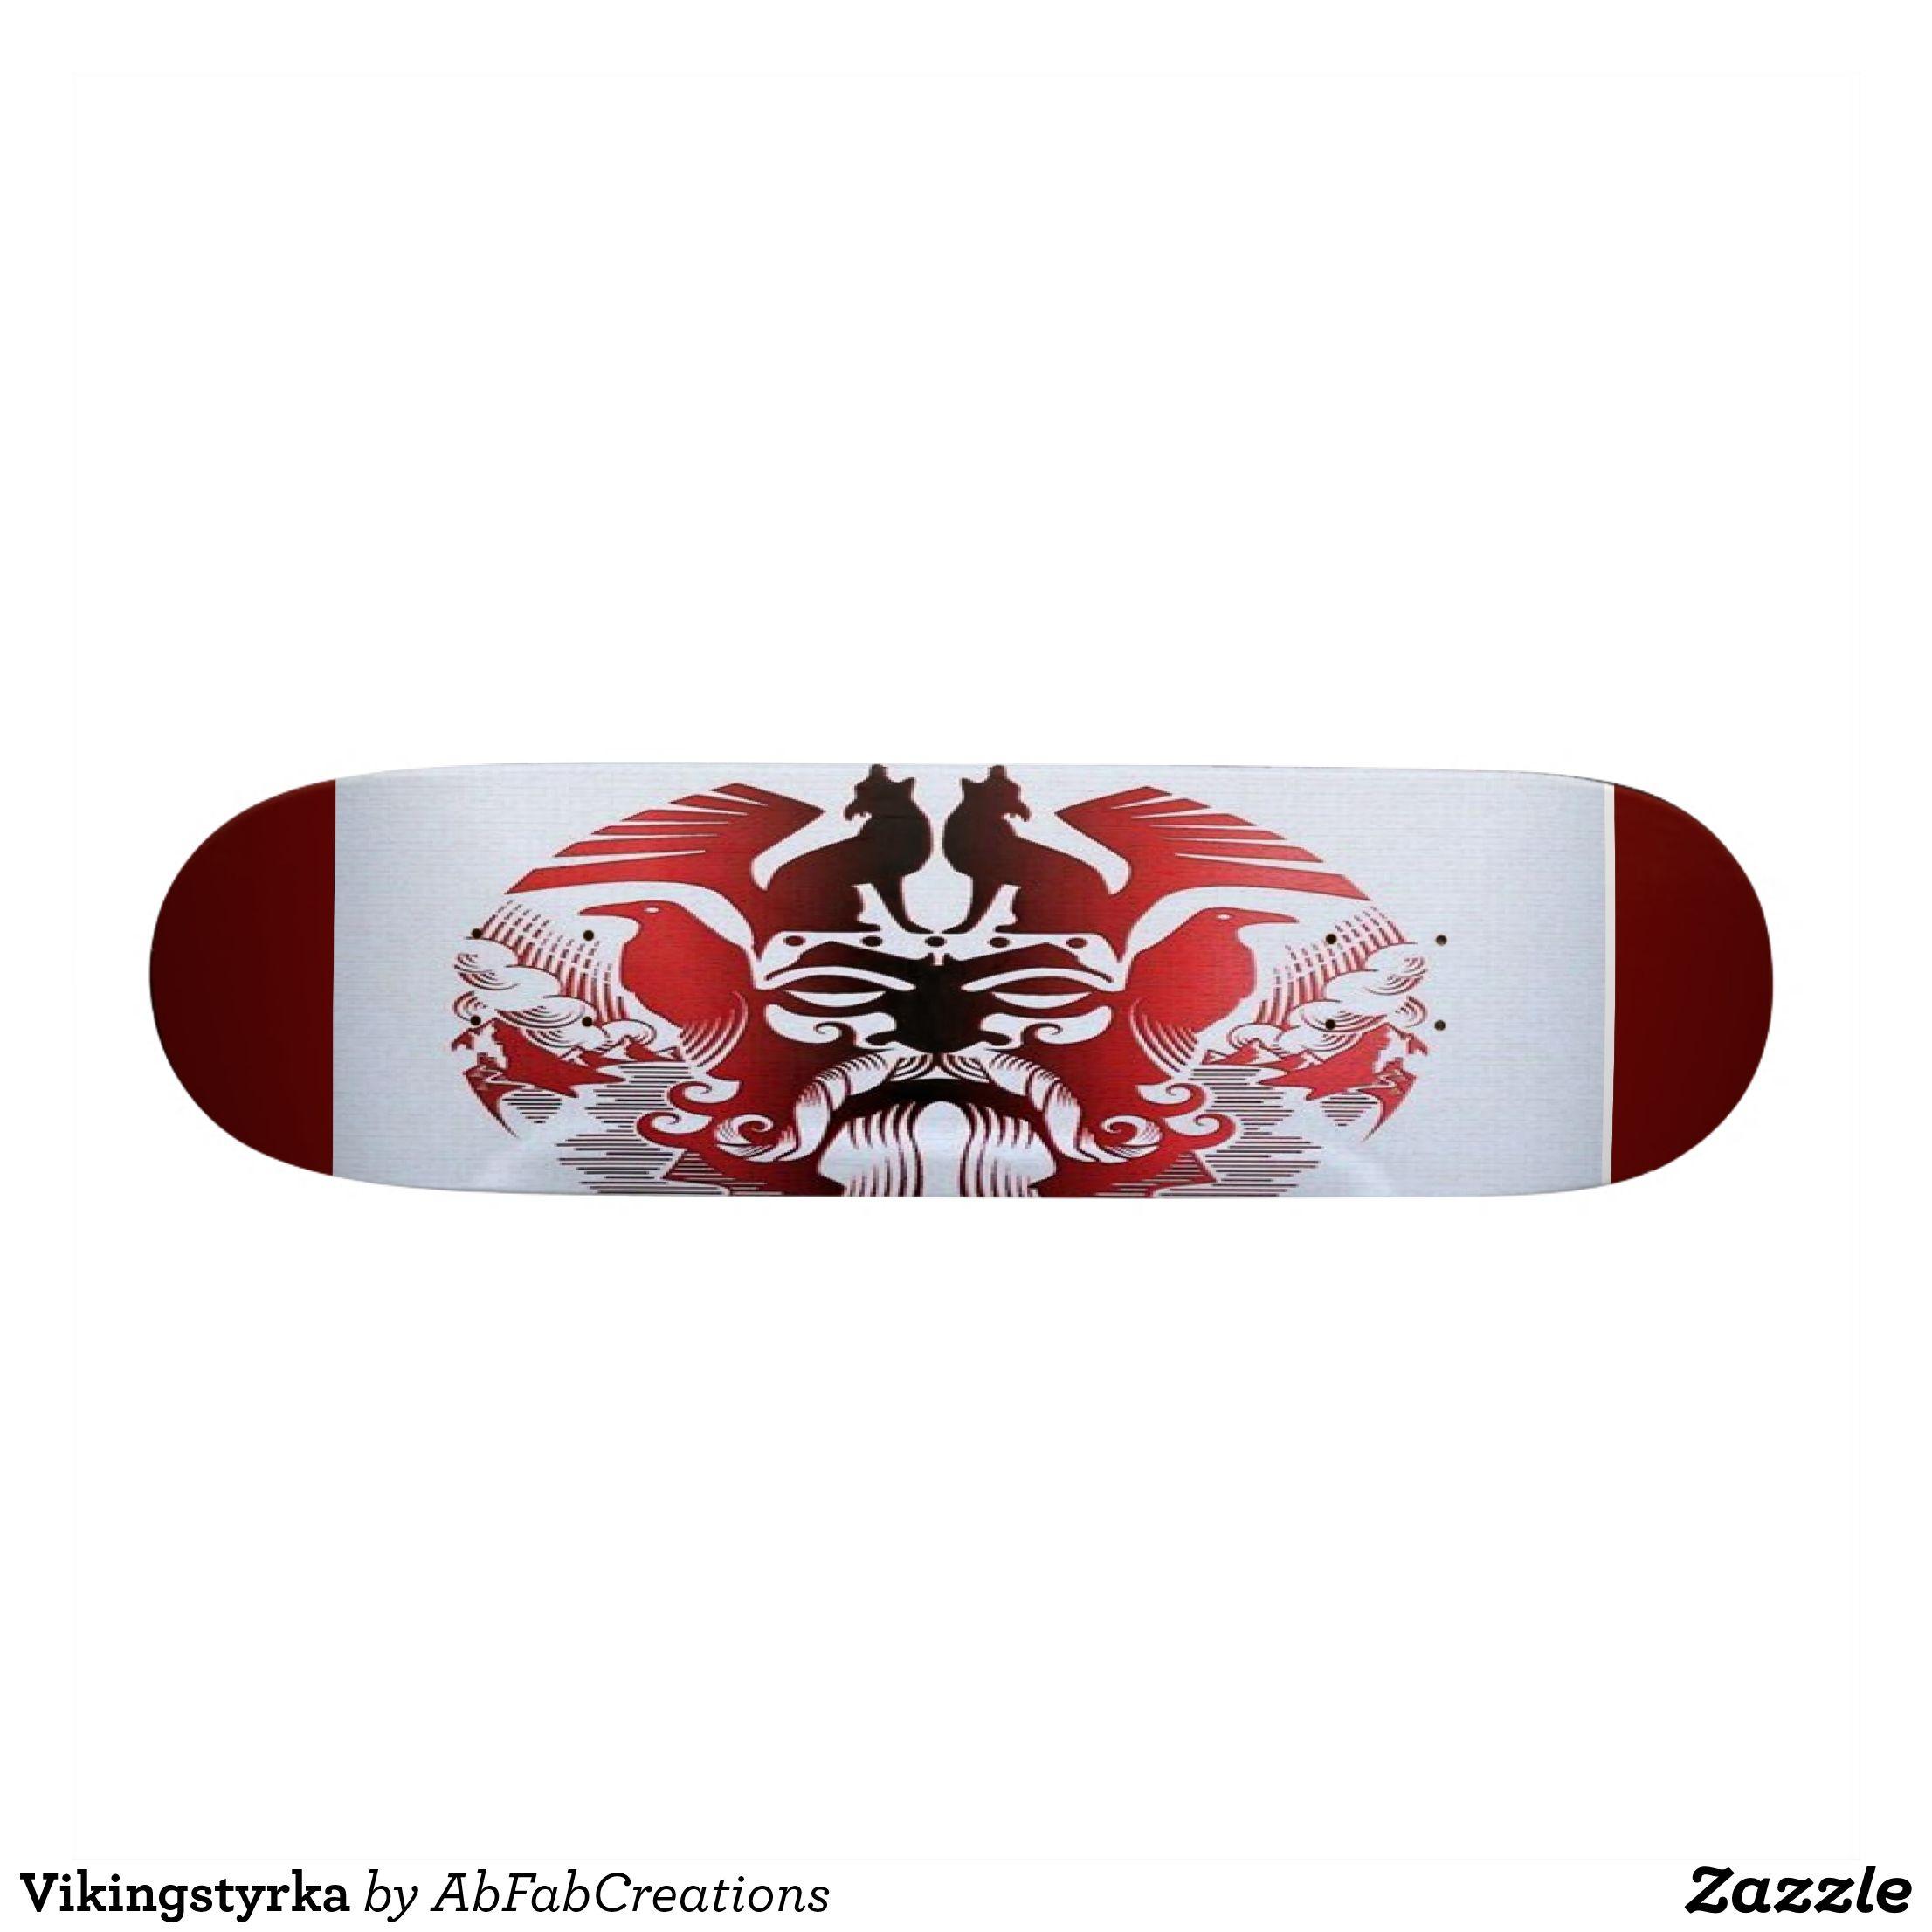 Vikingstyrka Skateboard - Supreme Hard-Rock Maple Deck Custom Boards By Talented Fashion & Graphic Designers - #skating #skater #skateboarding #shopping #bargain #sale #stylish #cool #graphicdesign #trendy #design #designer #graphicdesigner #style